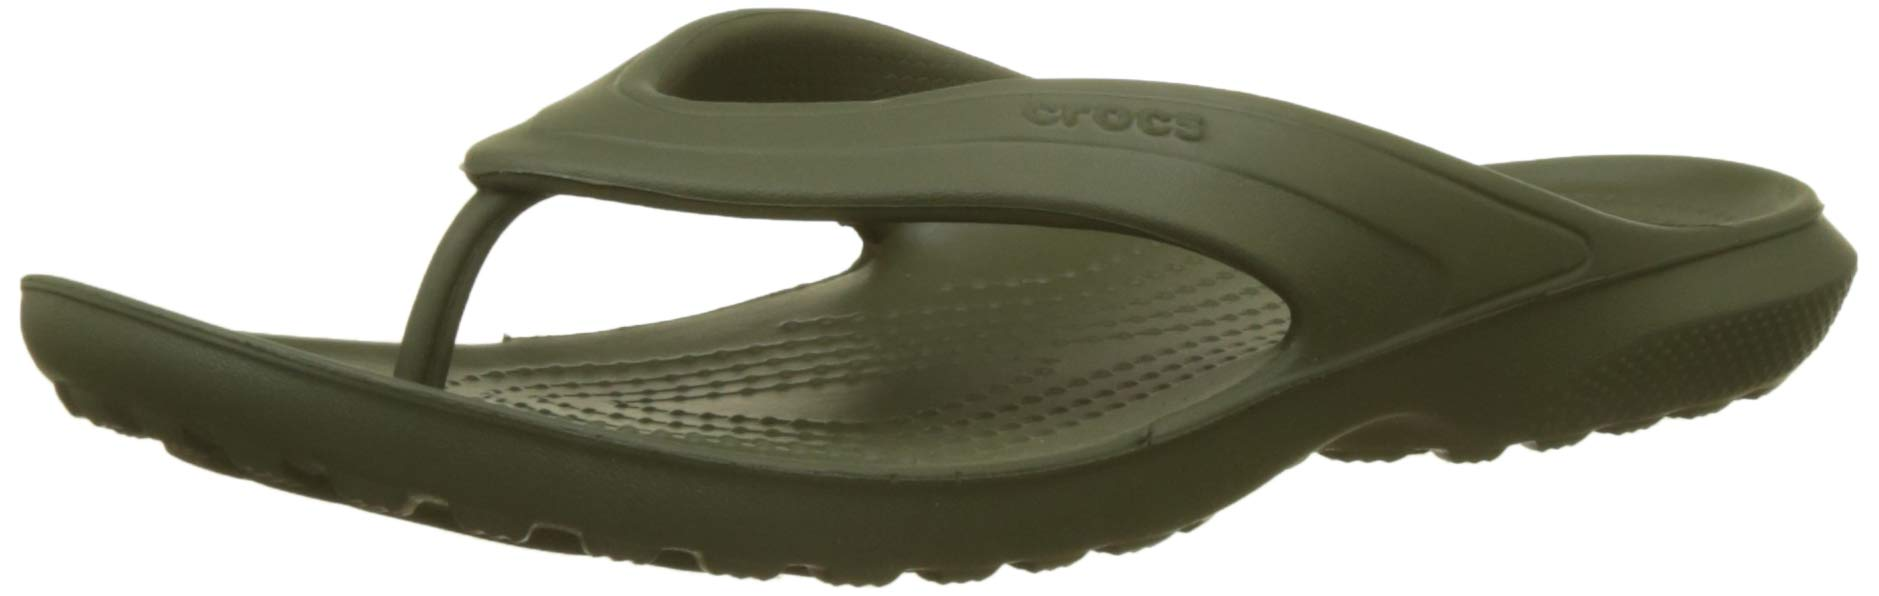 Crocs Women's Classic Flip Flop